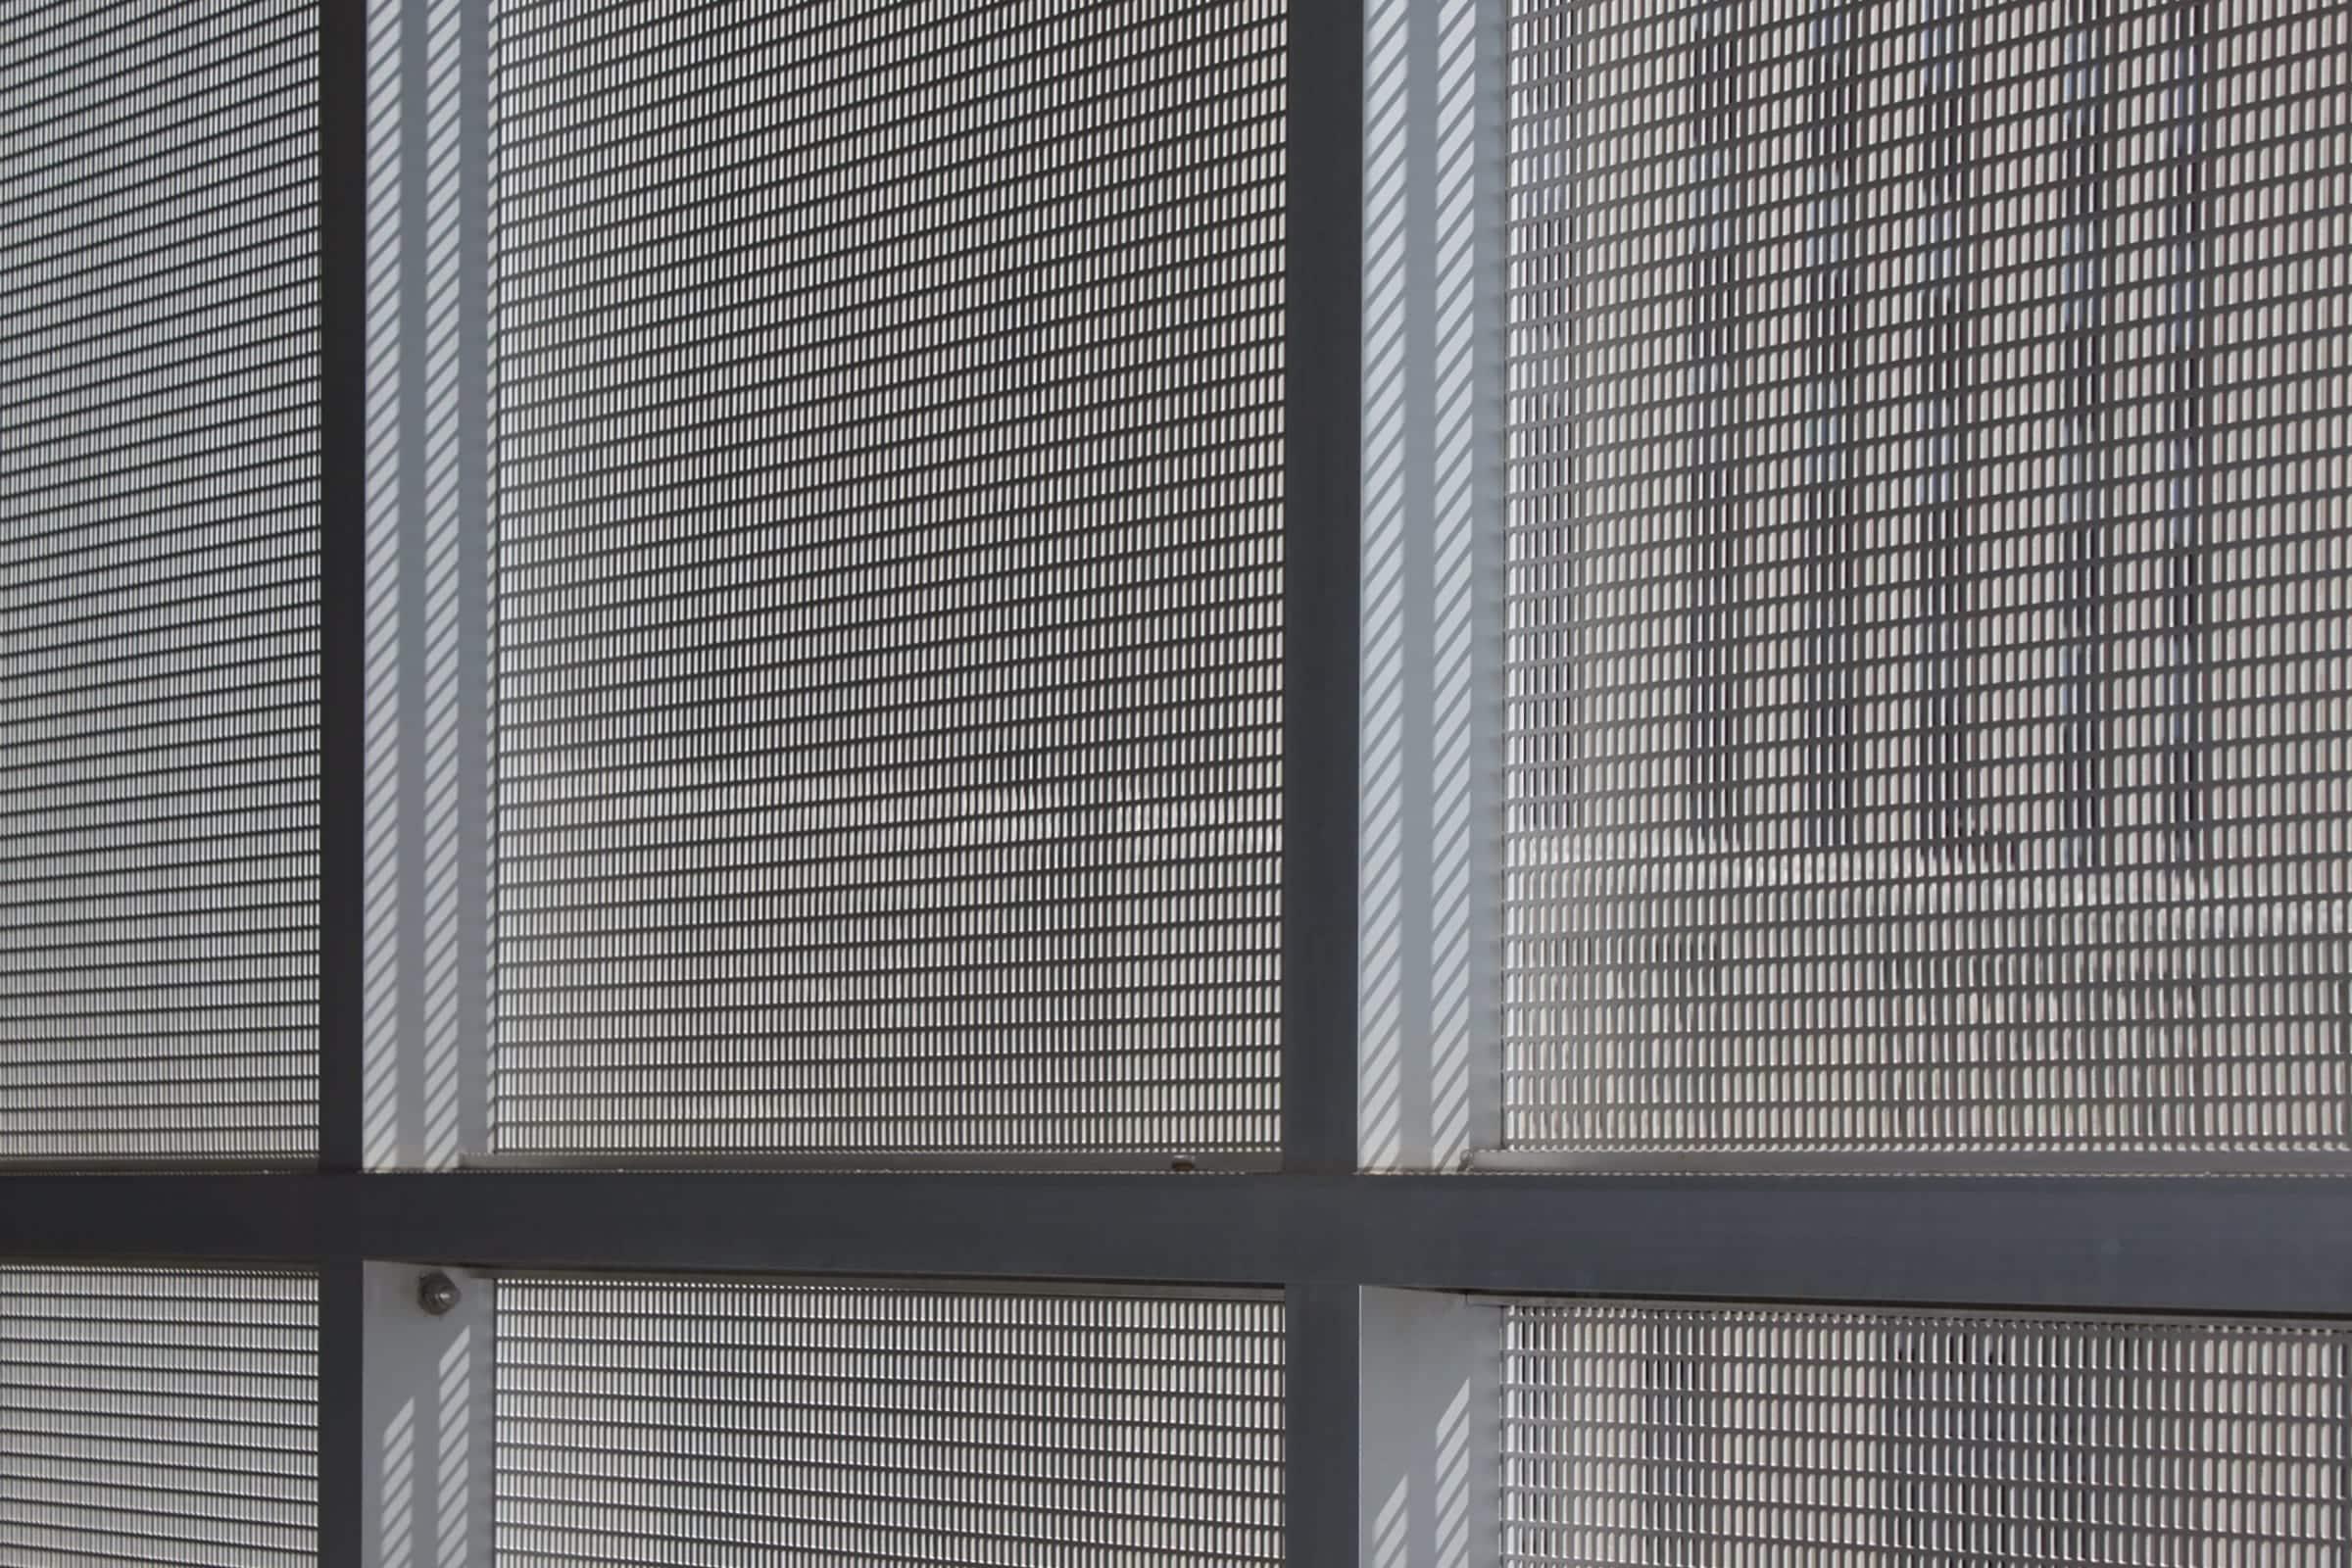 Interior mullion attachment for the perforated metal aluminum panels.